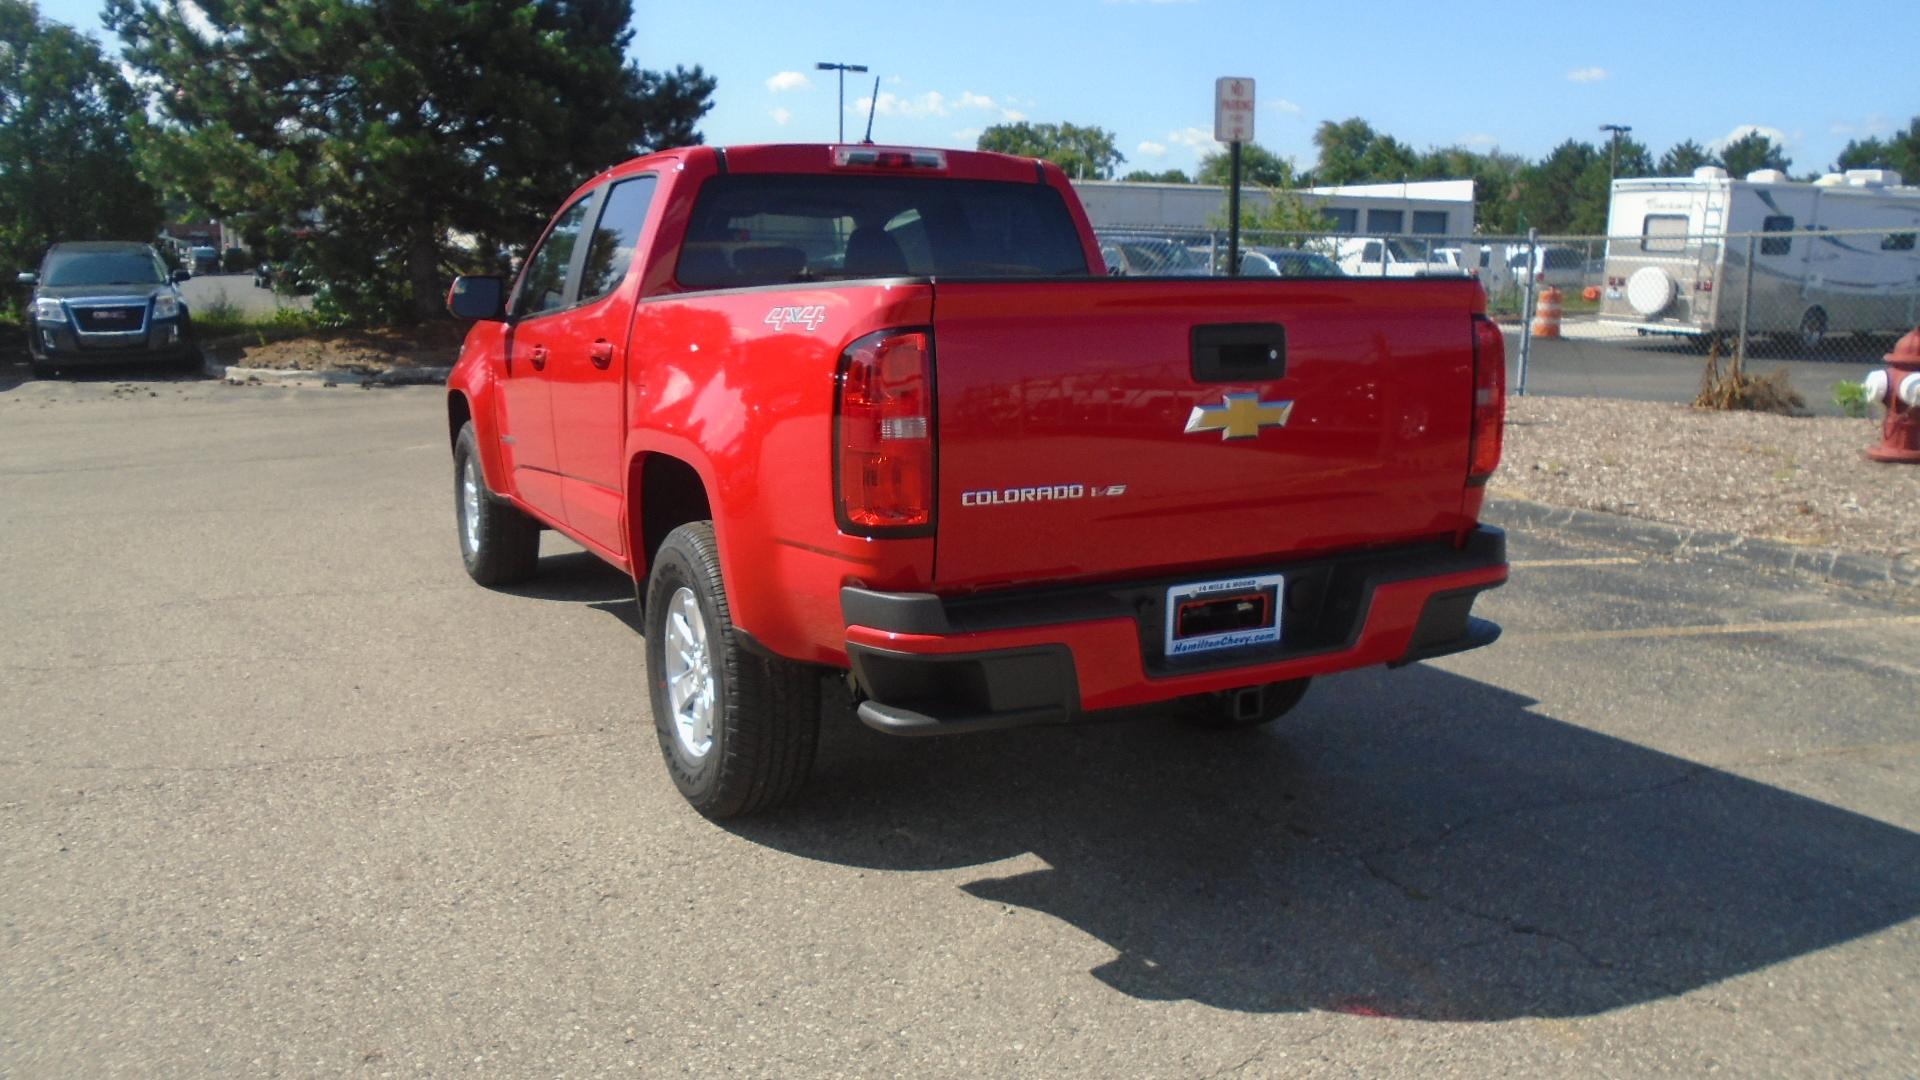 2020 Colorado Crew Cab 4x4, Pickup #85181 - photo 2